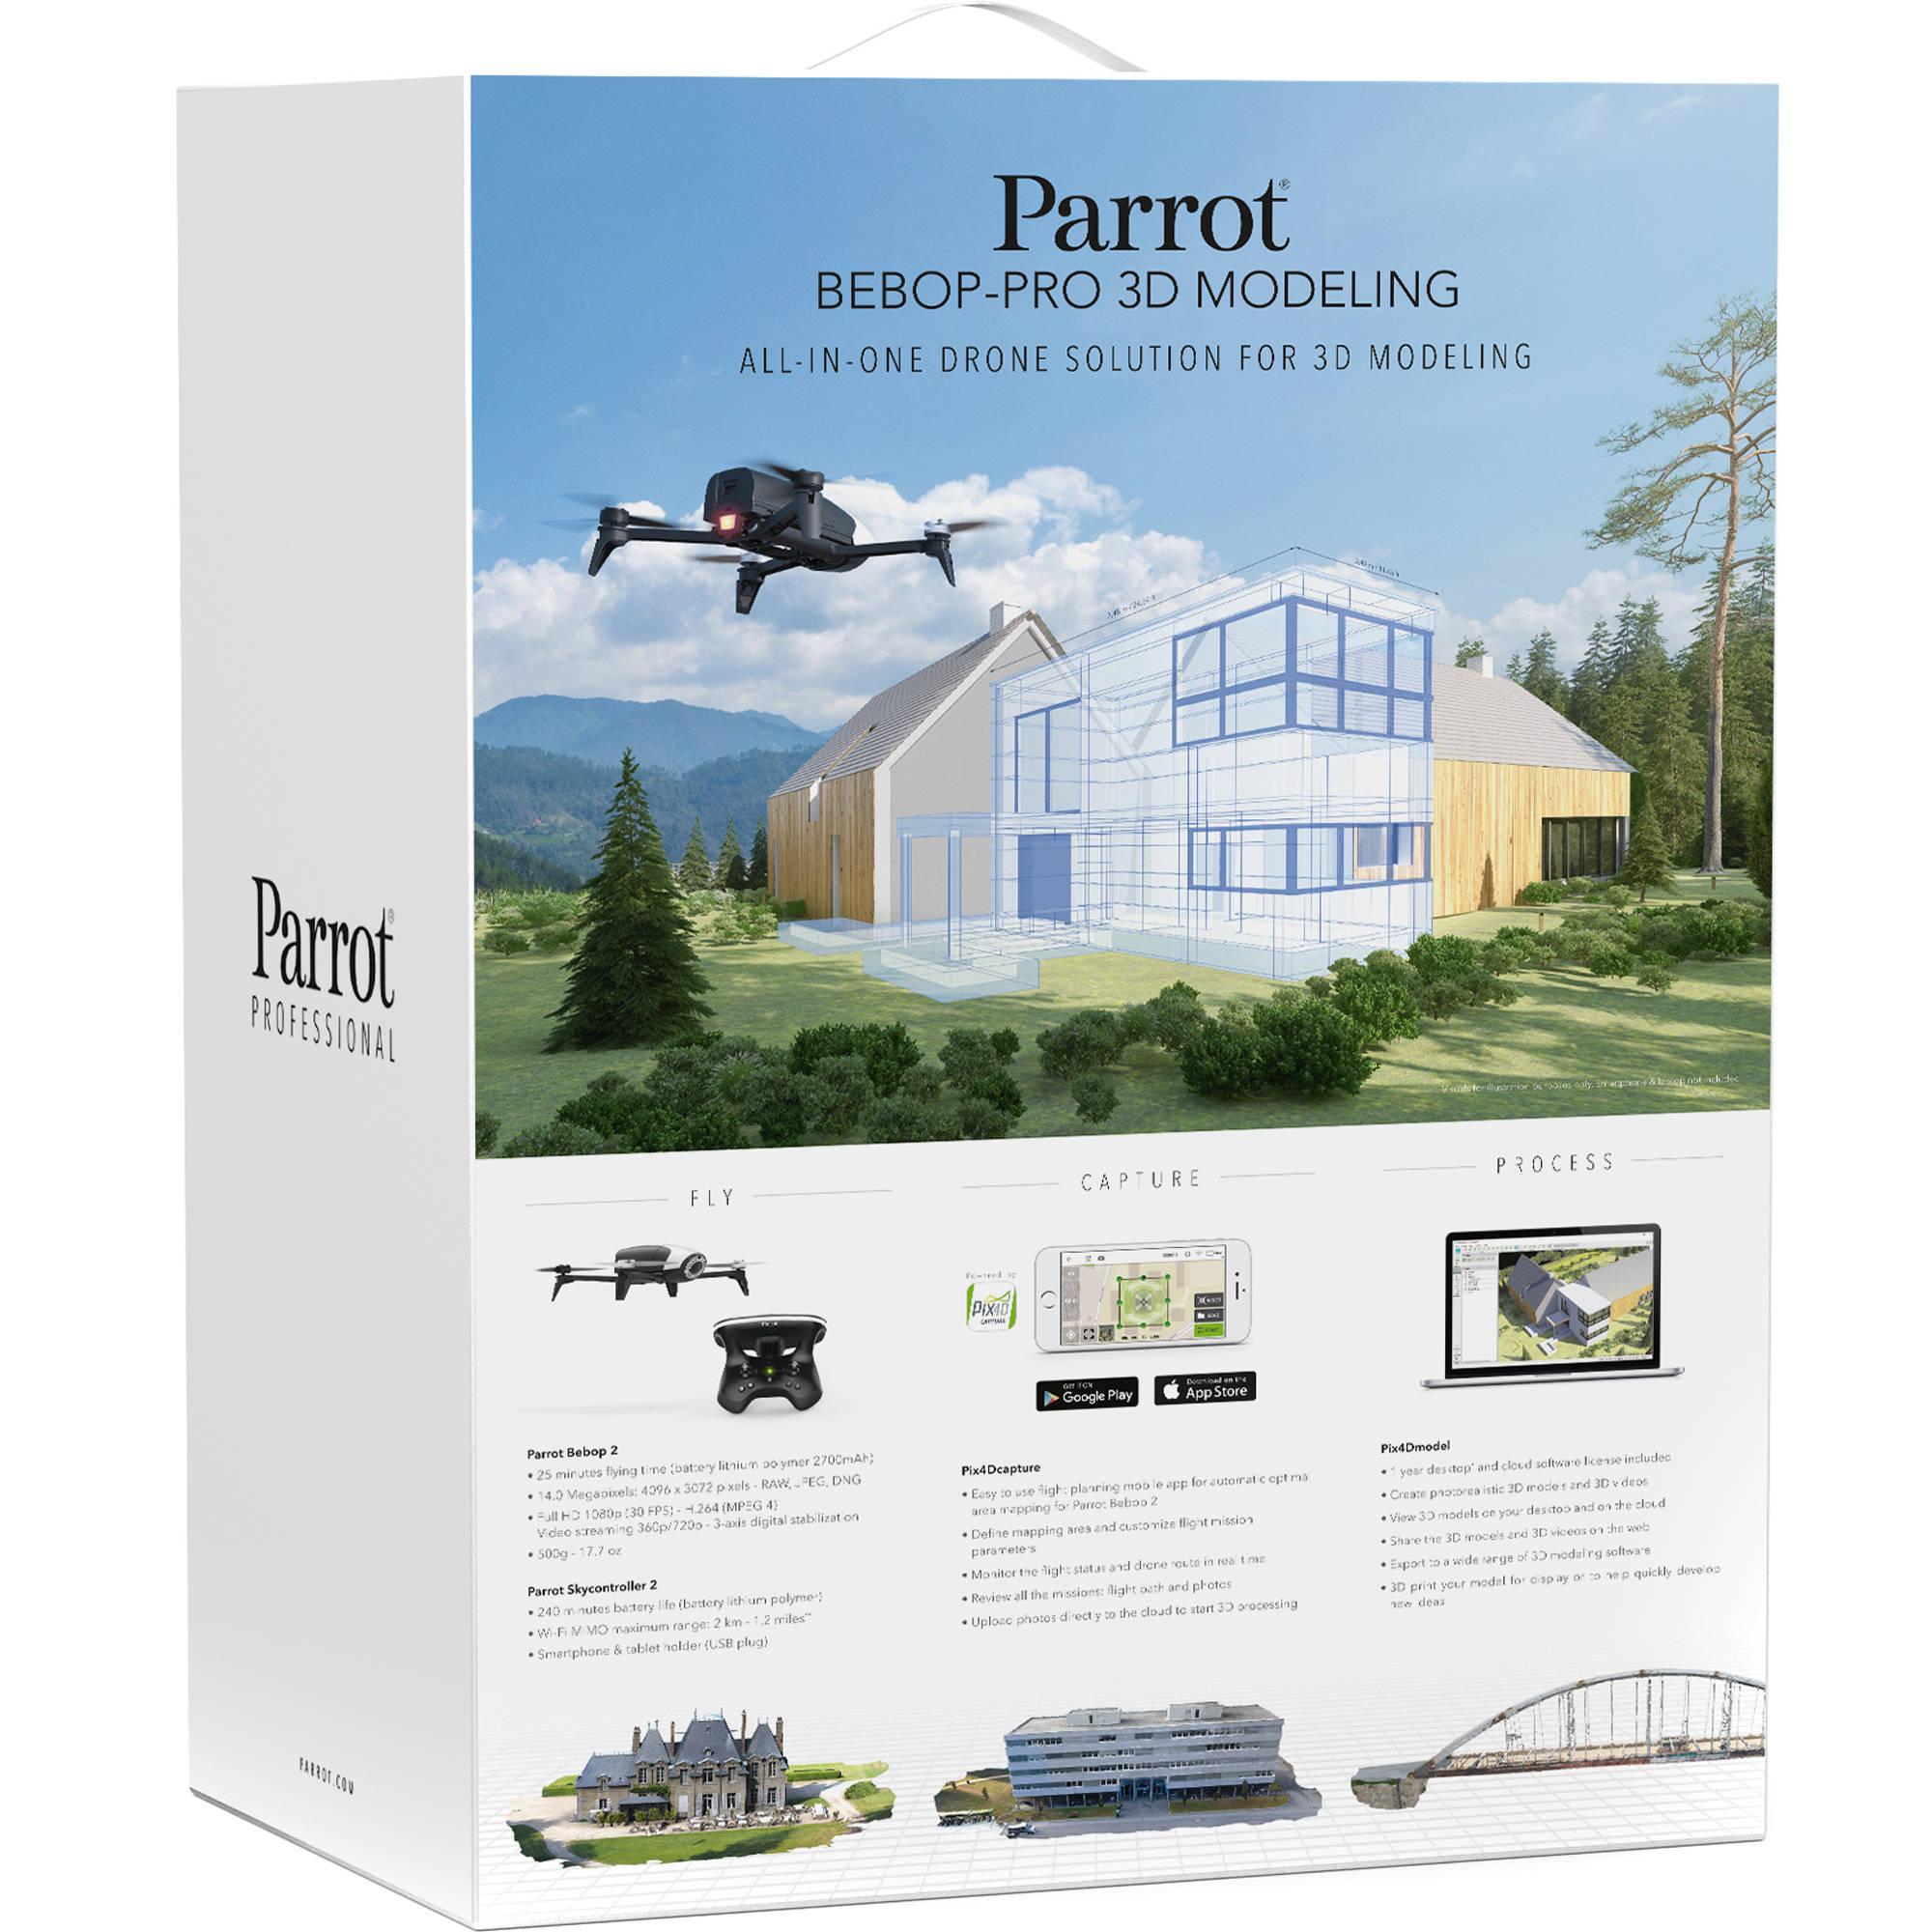 Parrot Bebop Pro 3D Modeling Drone with 14 Megapixel Flight Camera (White)